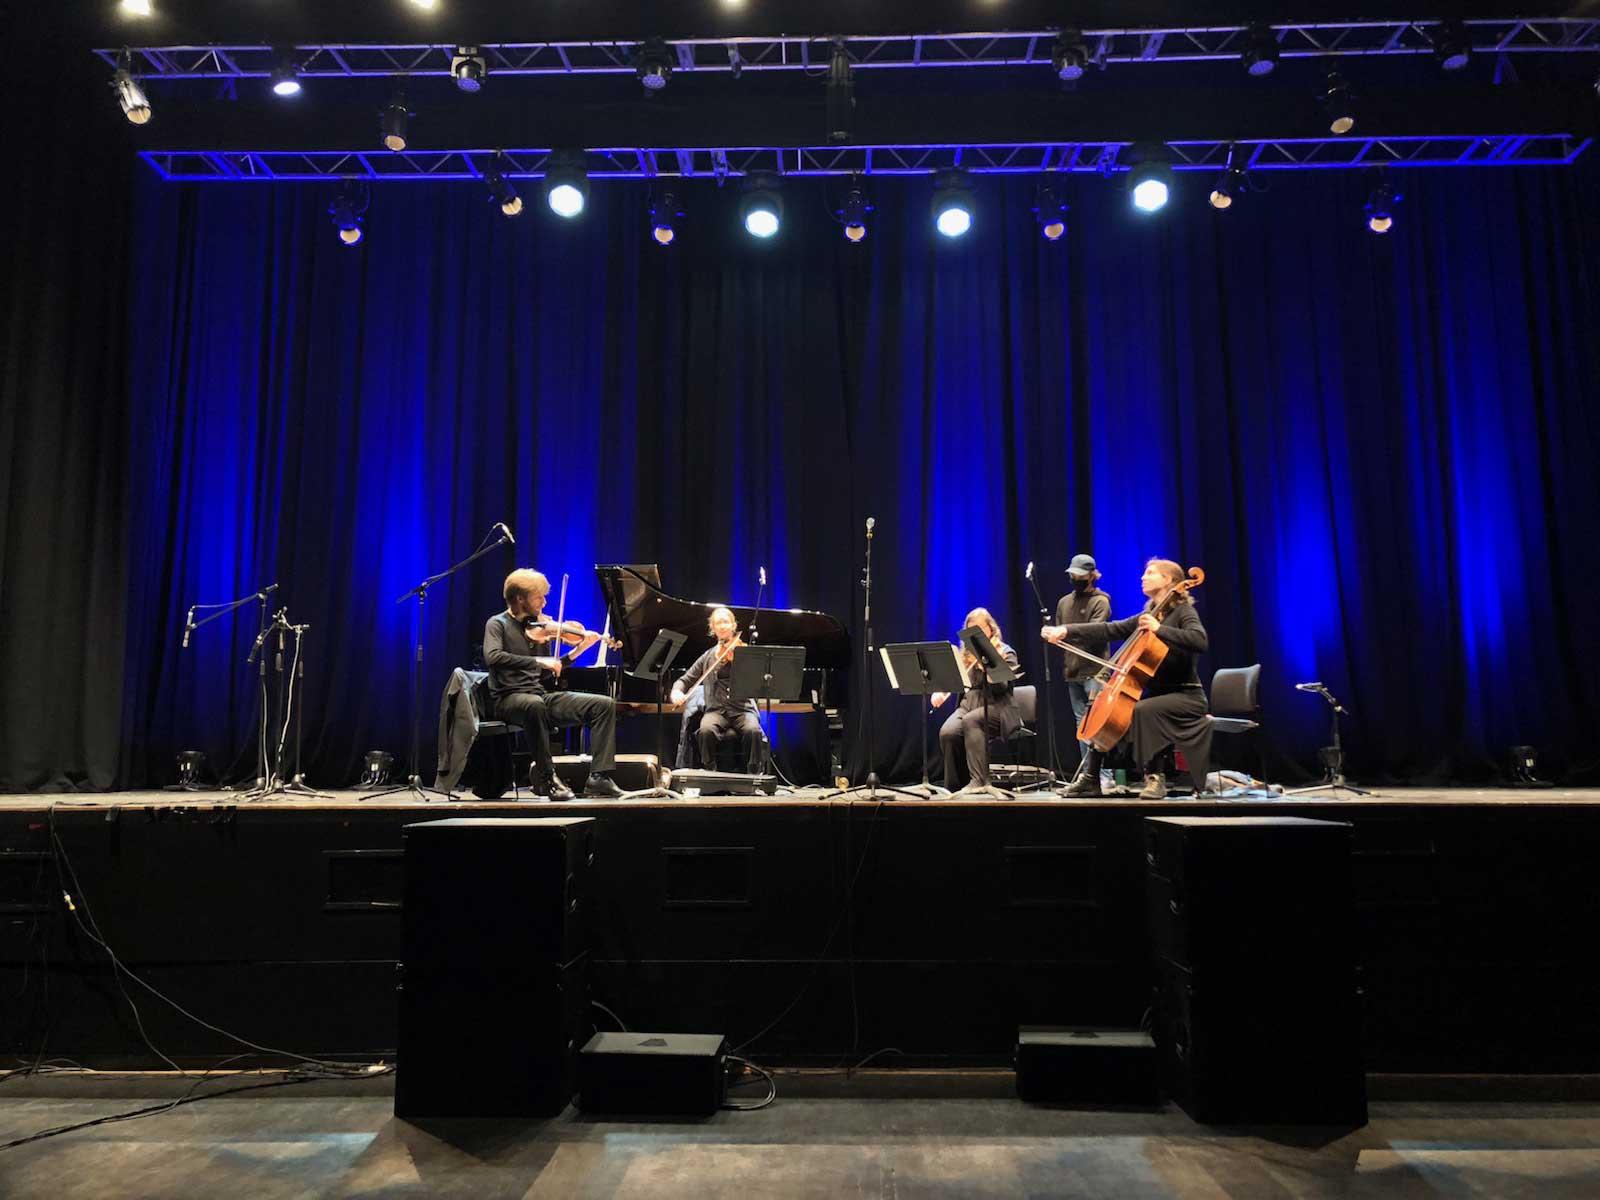 The Gildas rehearsing in the Brighton Dome Concert Hall